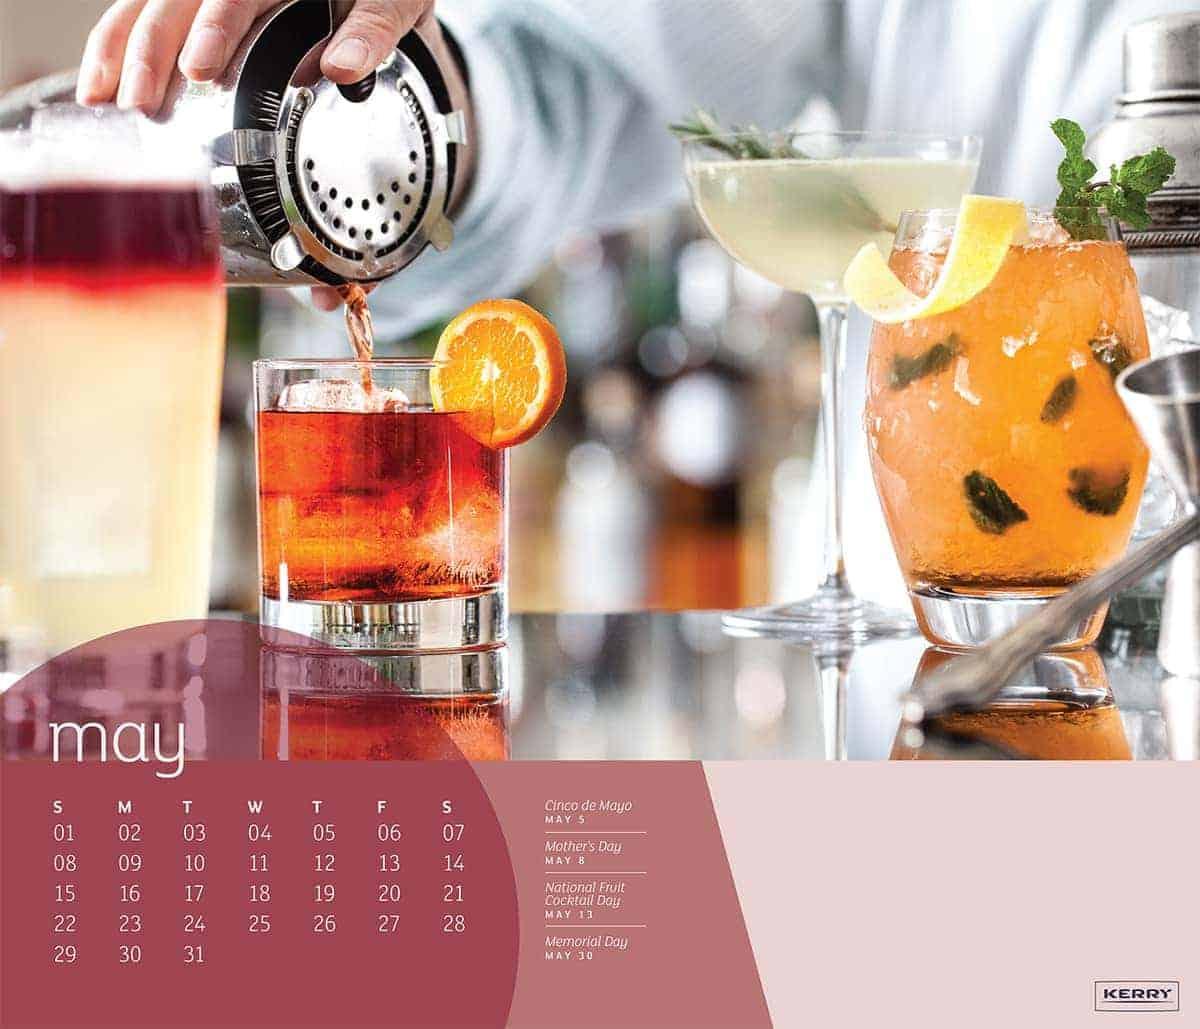 2016 Kerry Holiday Calendar_Jena Carlin Photography_96-7